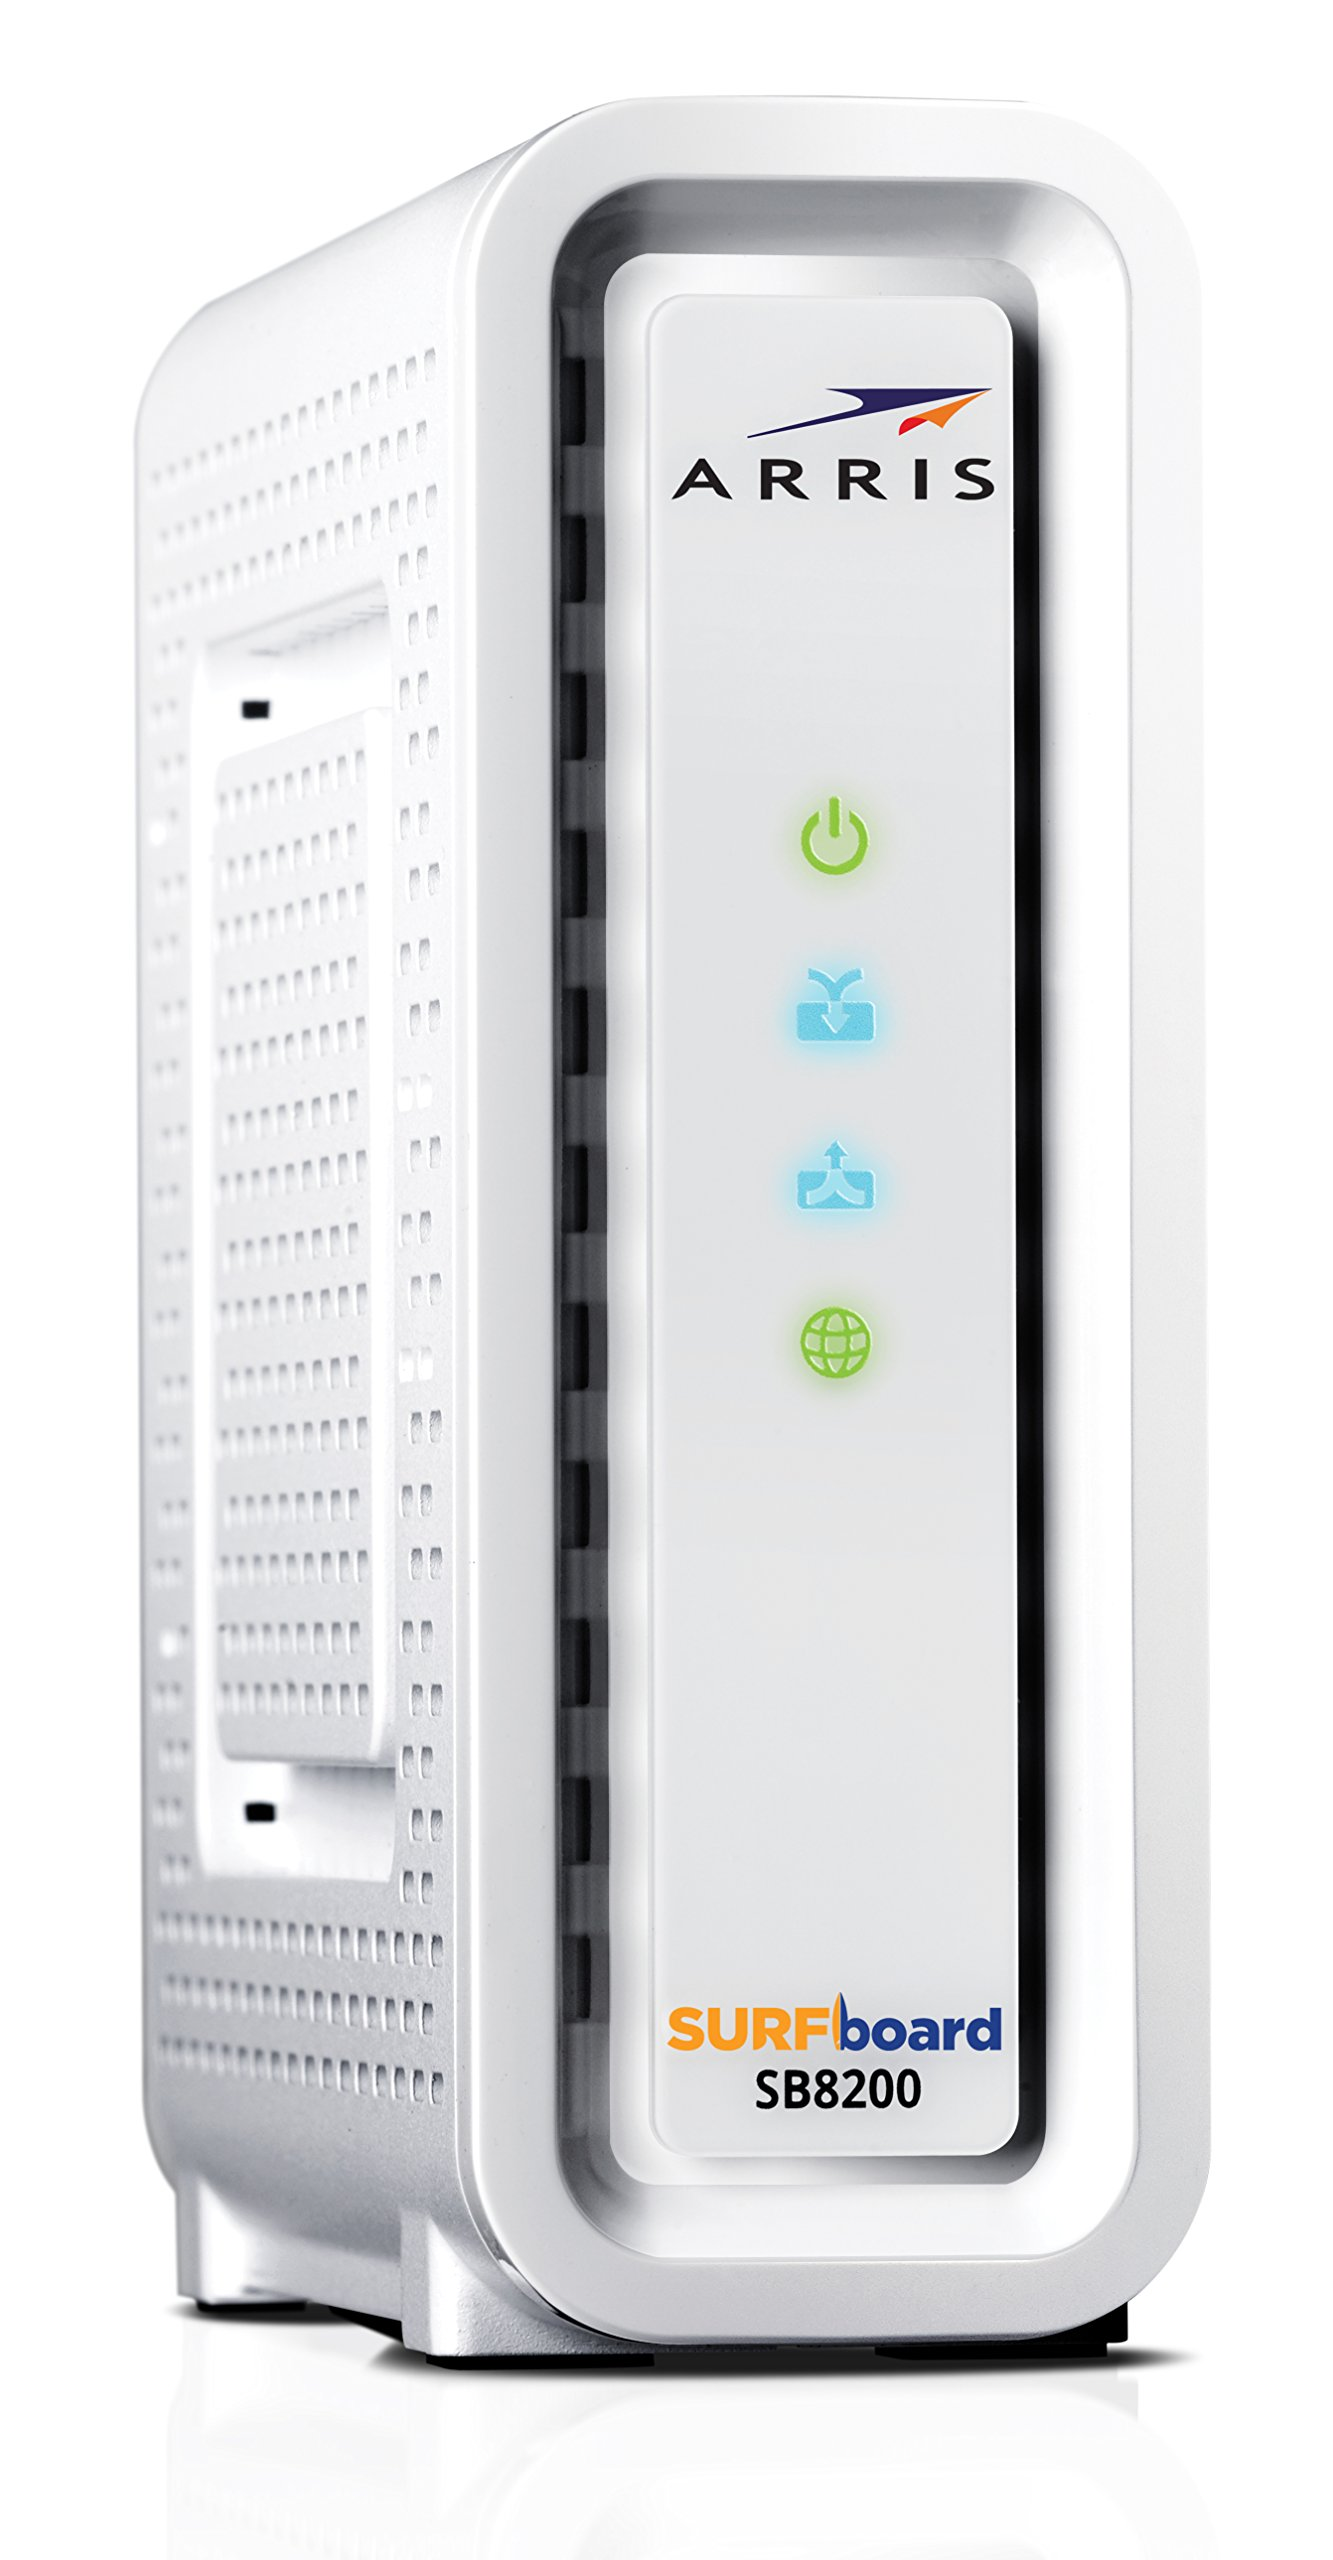 ARRIS Surfboard Docsis 3.1 Cable Modem - (Renewed) SB8200-Rb